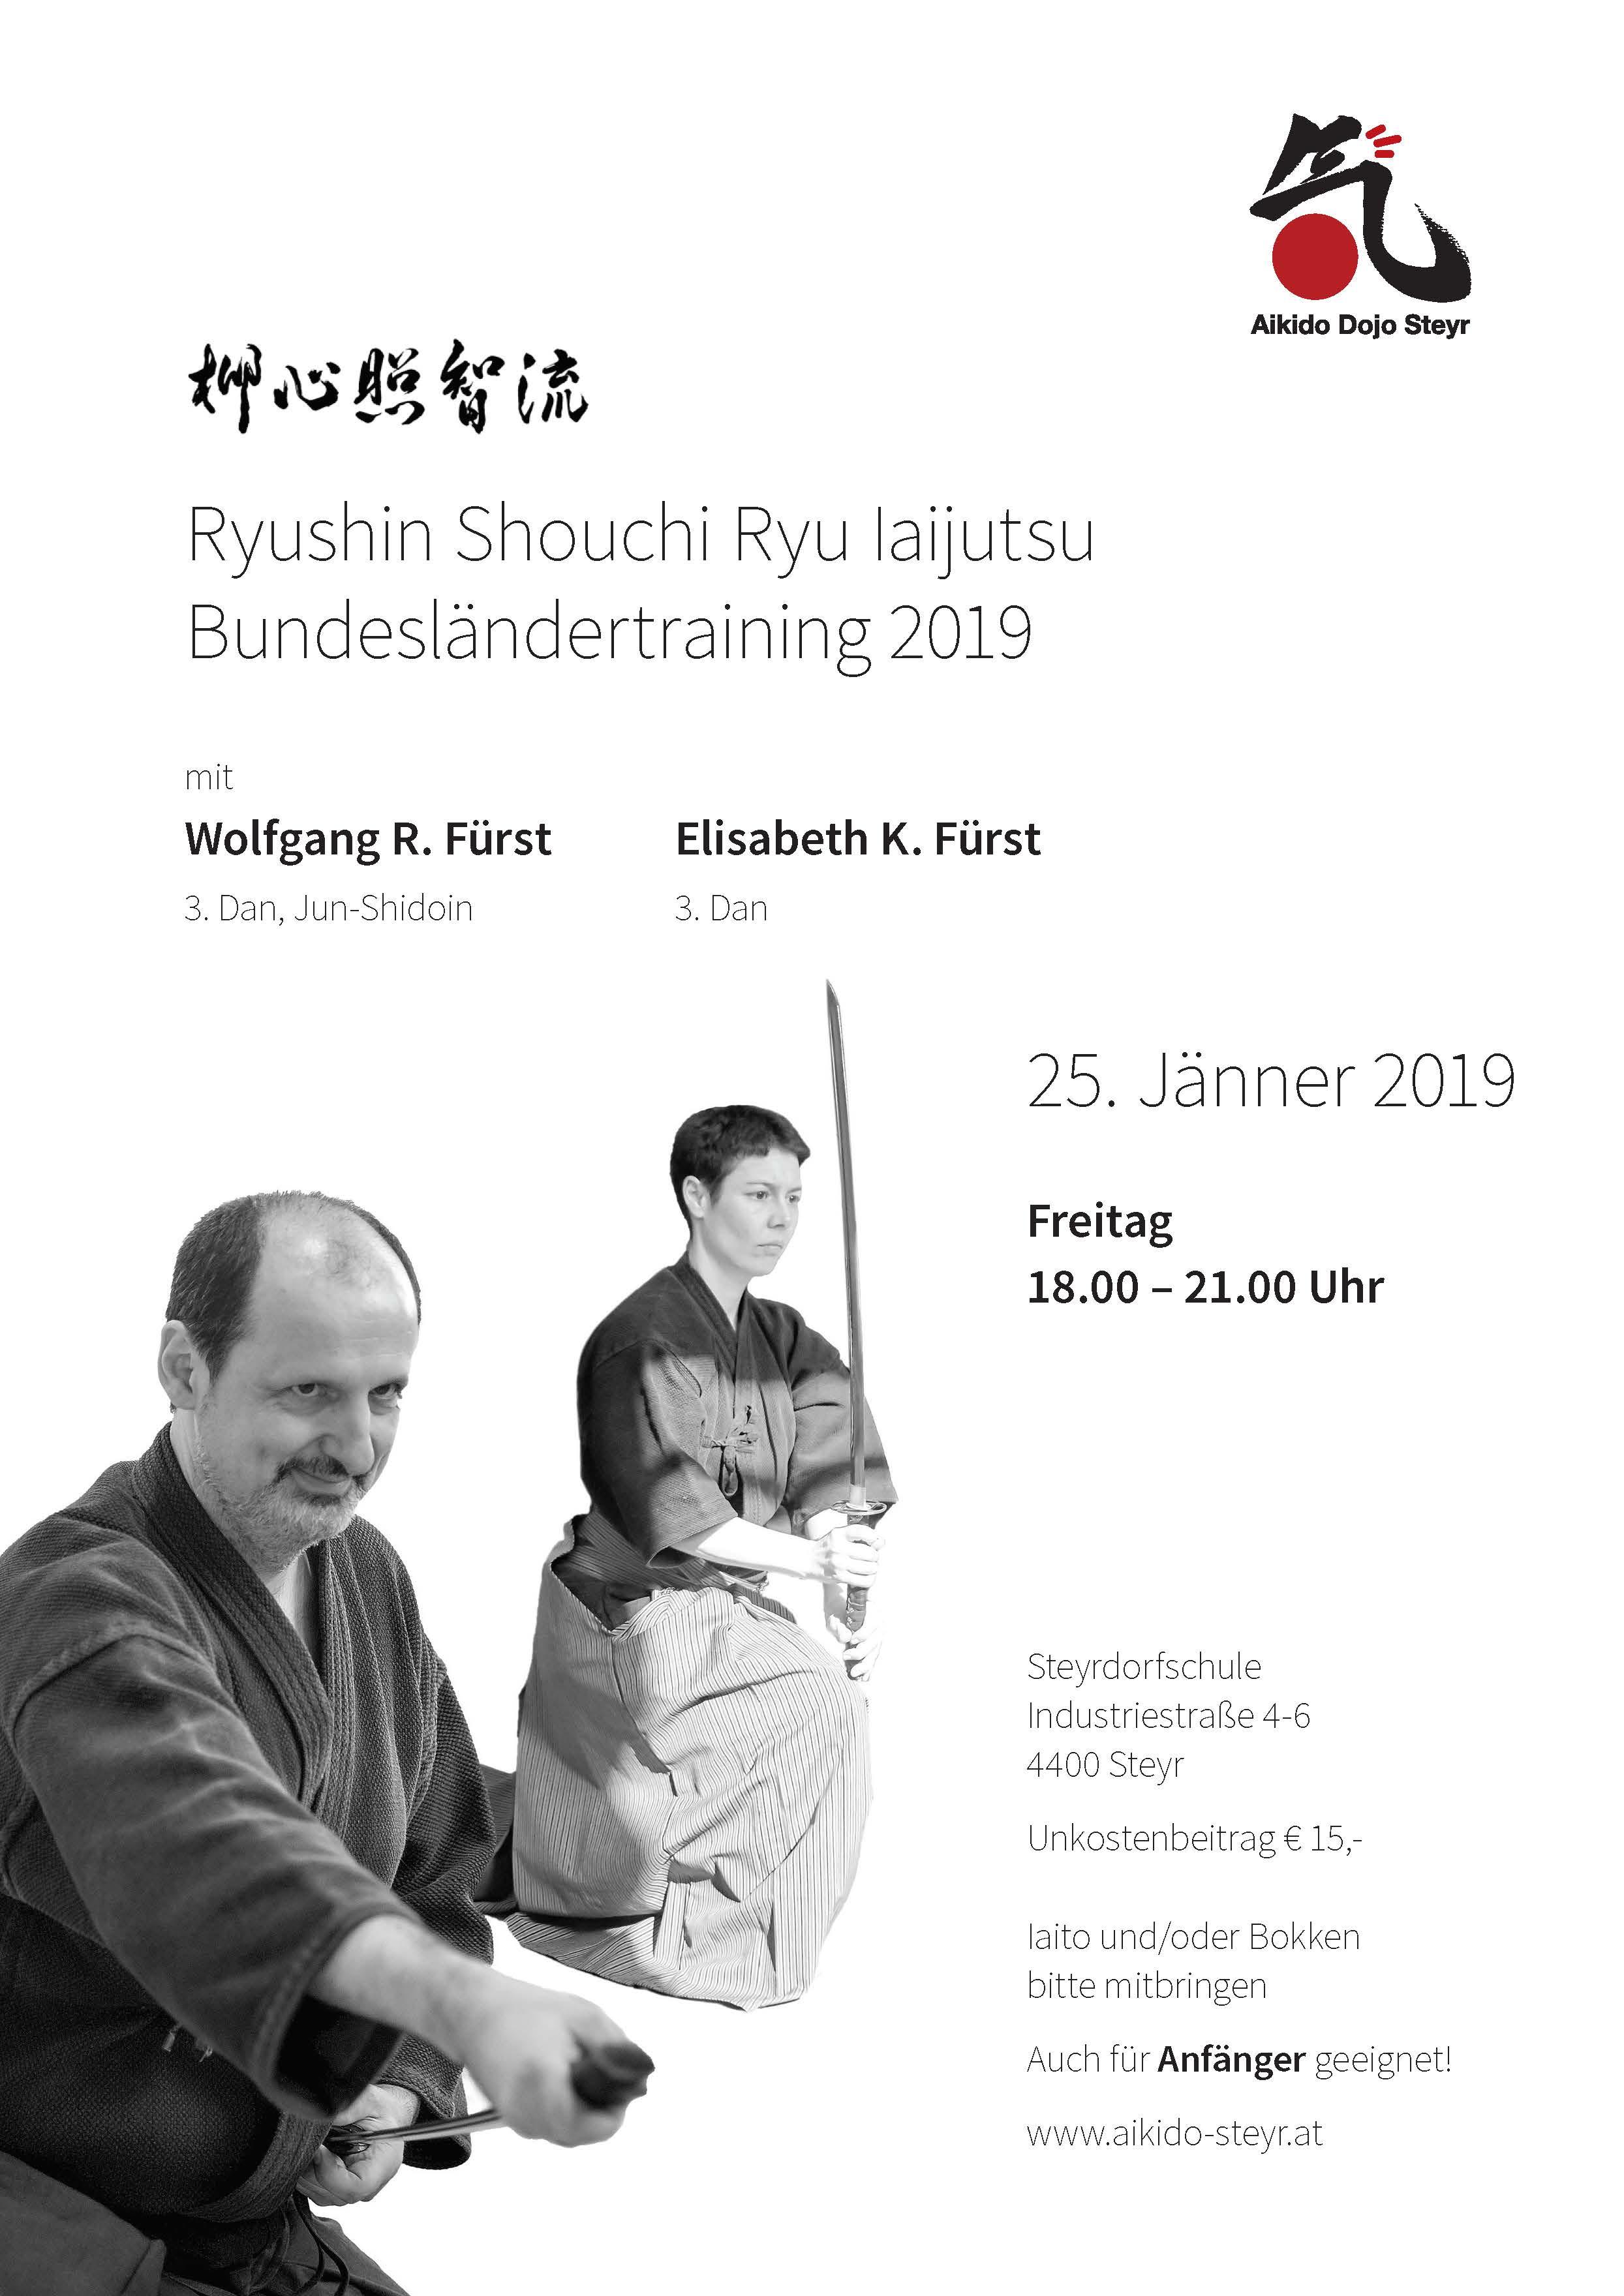 2019_Ryushin_Bundesländertraining_ STEYR_012019.jpg